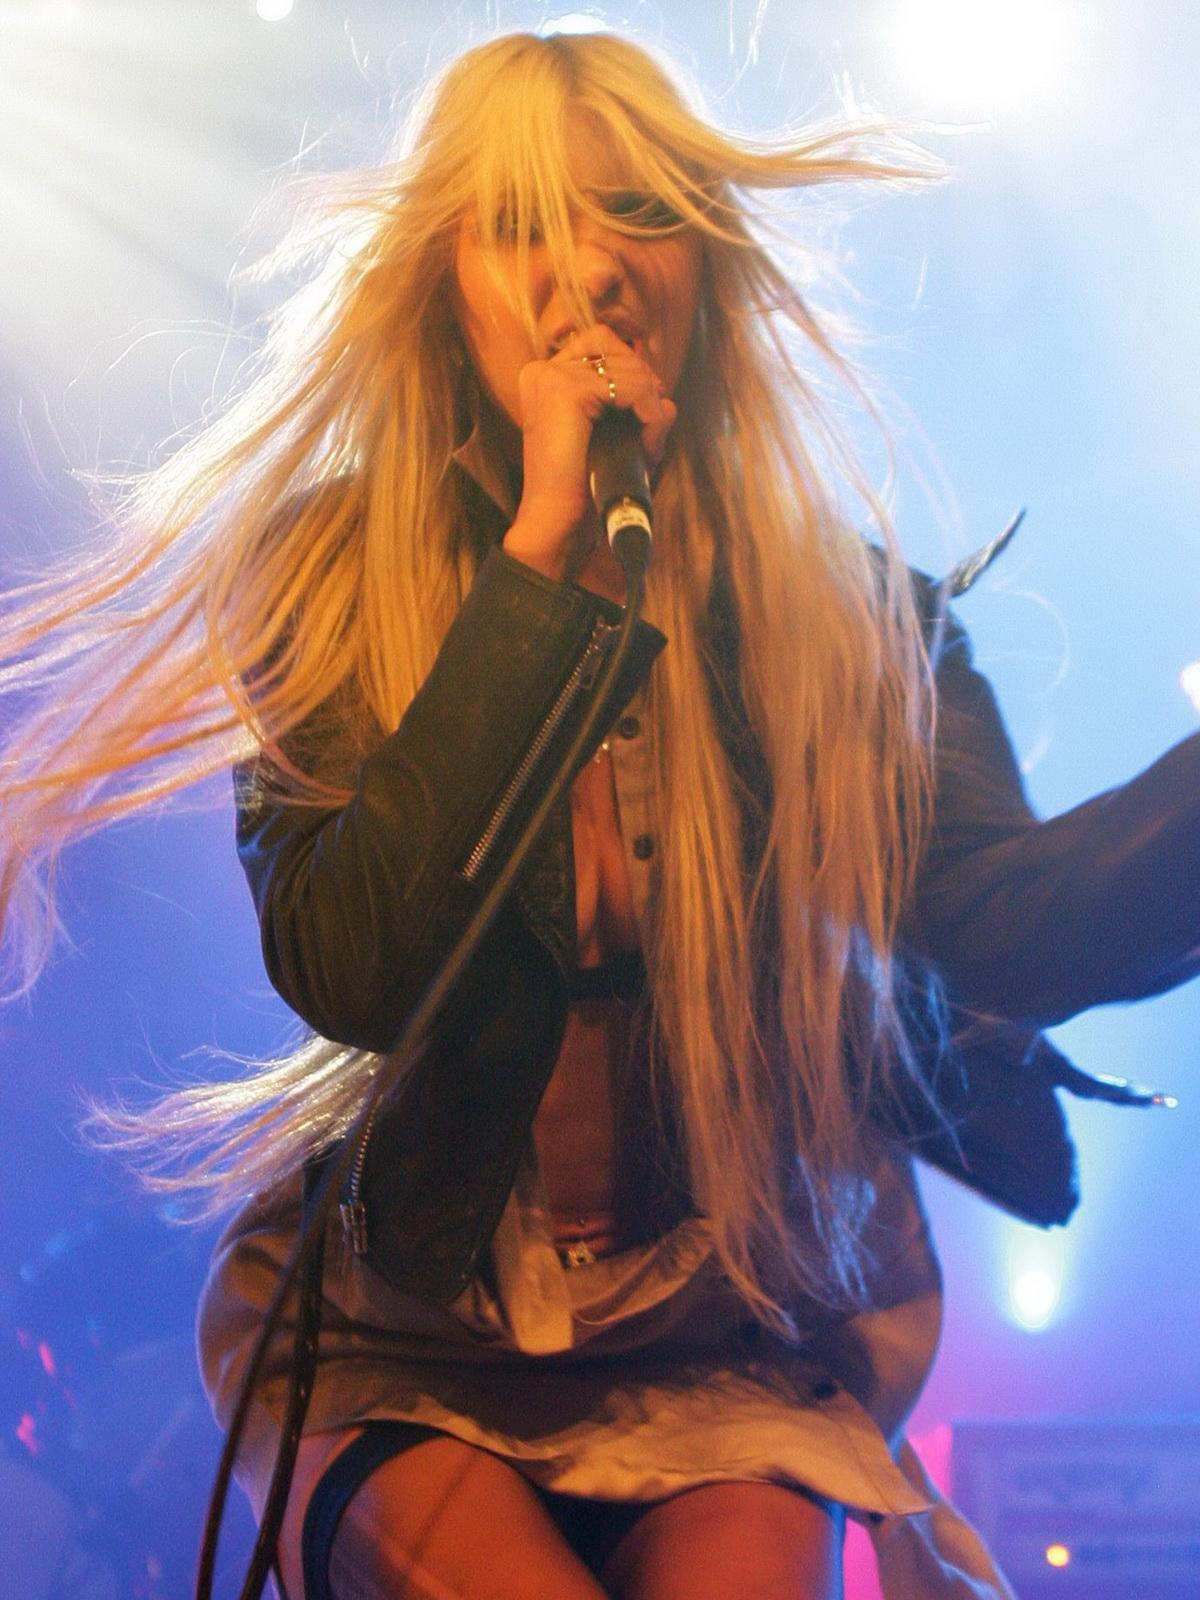 http://2.bp.blogspot.com/_NRGPIrDtEg8/TQsw9DHKZiI/AAAAAAAAAbY/JxaNqVMuiF0/s1600/Taylor_Momsen_cleavage_7.jpg